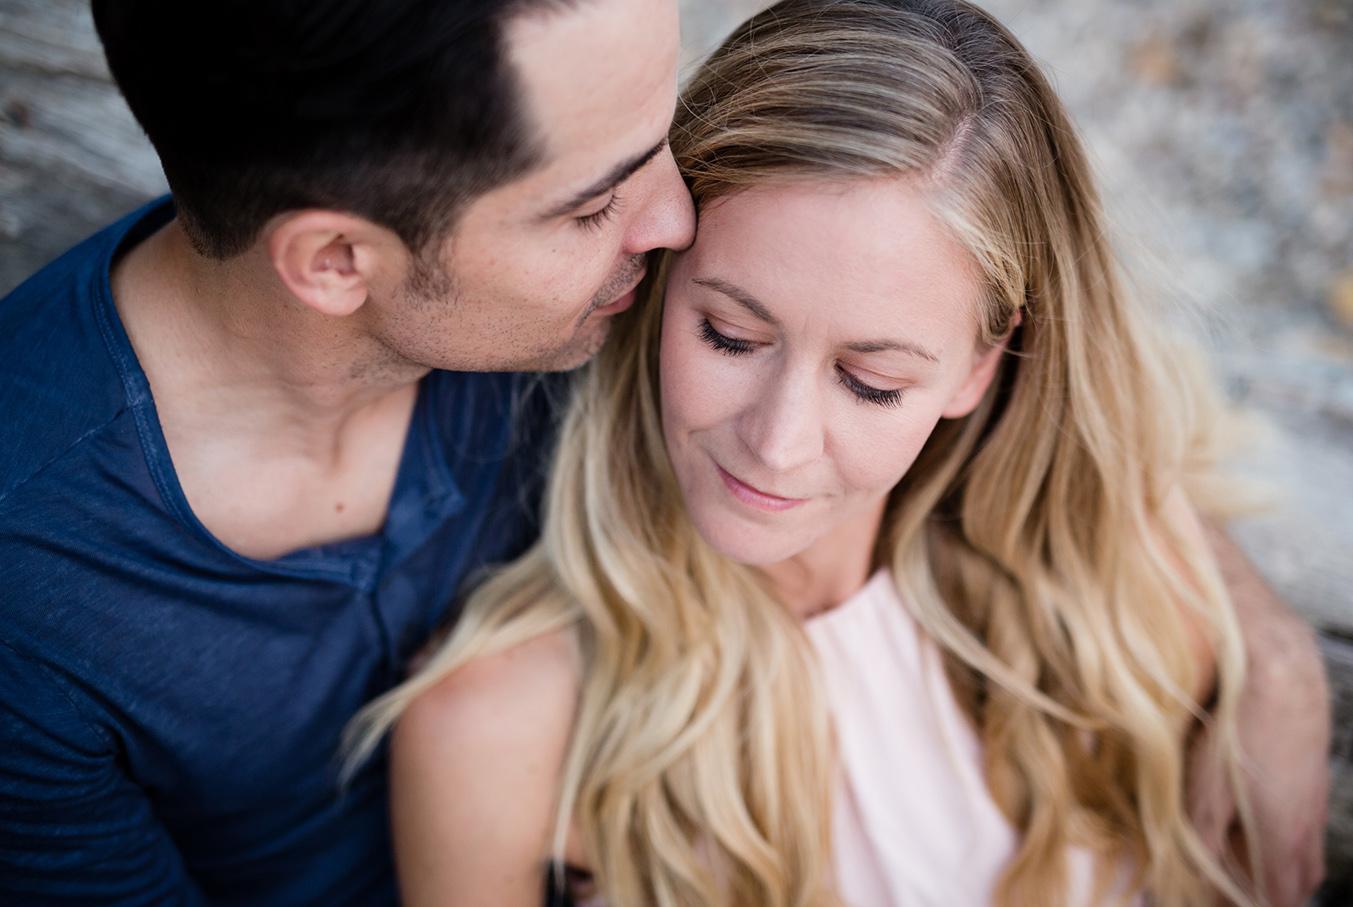 Vienna_Wien_Couple_Hochzeit_Paar_Verlobung_Engagement_Shooting_40